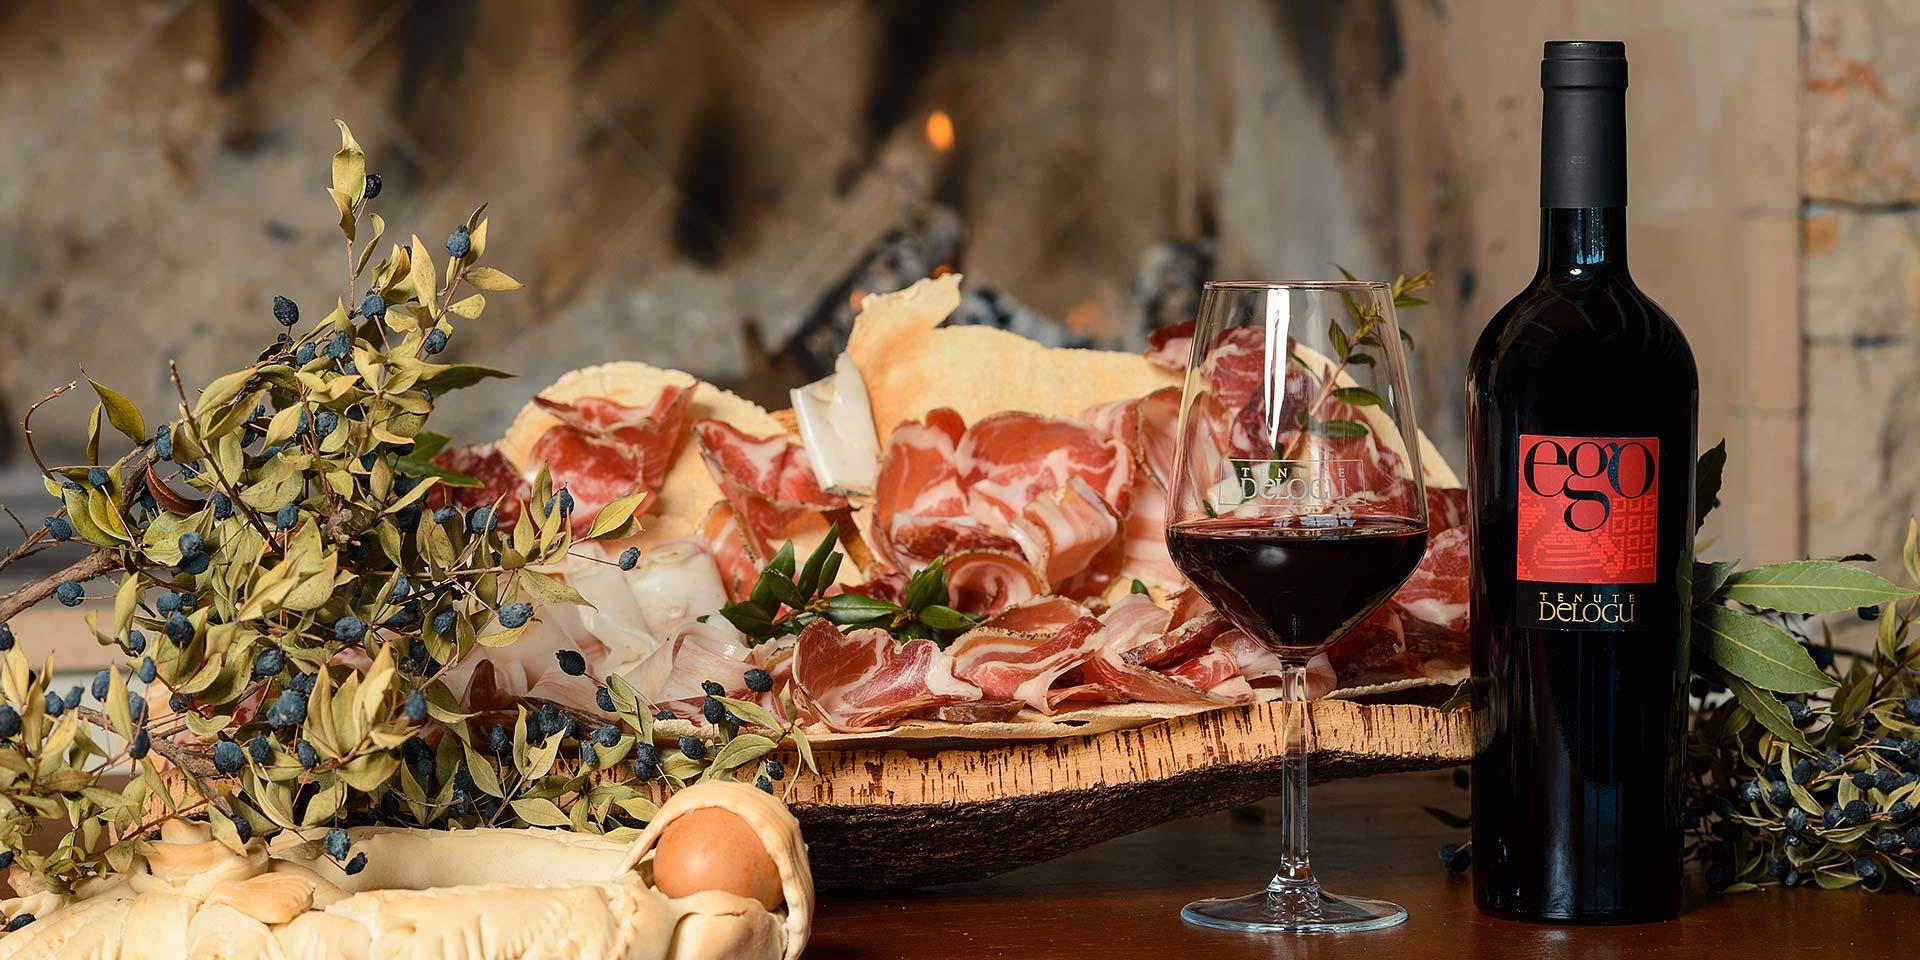 Agriturismo Tenute Delogu - Cena tipica sarda Alghero